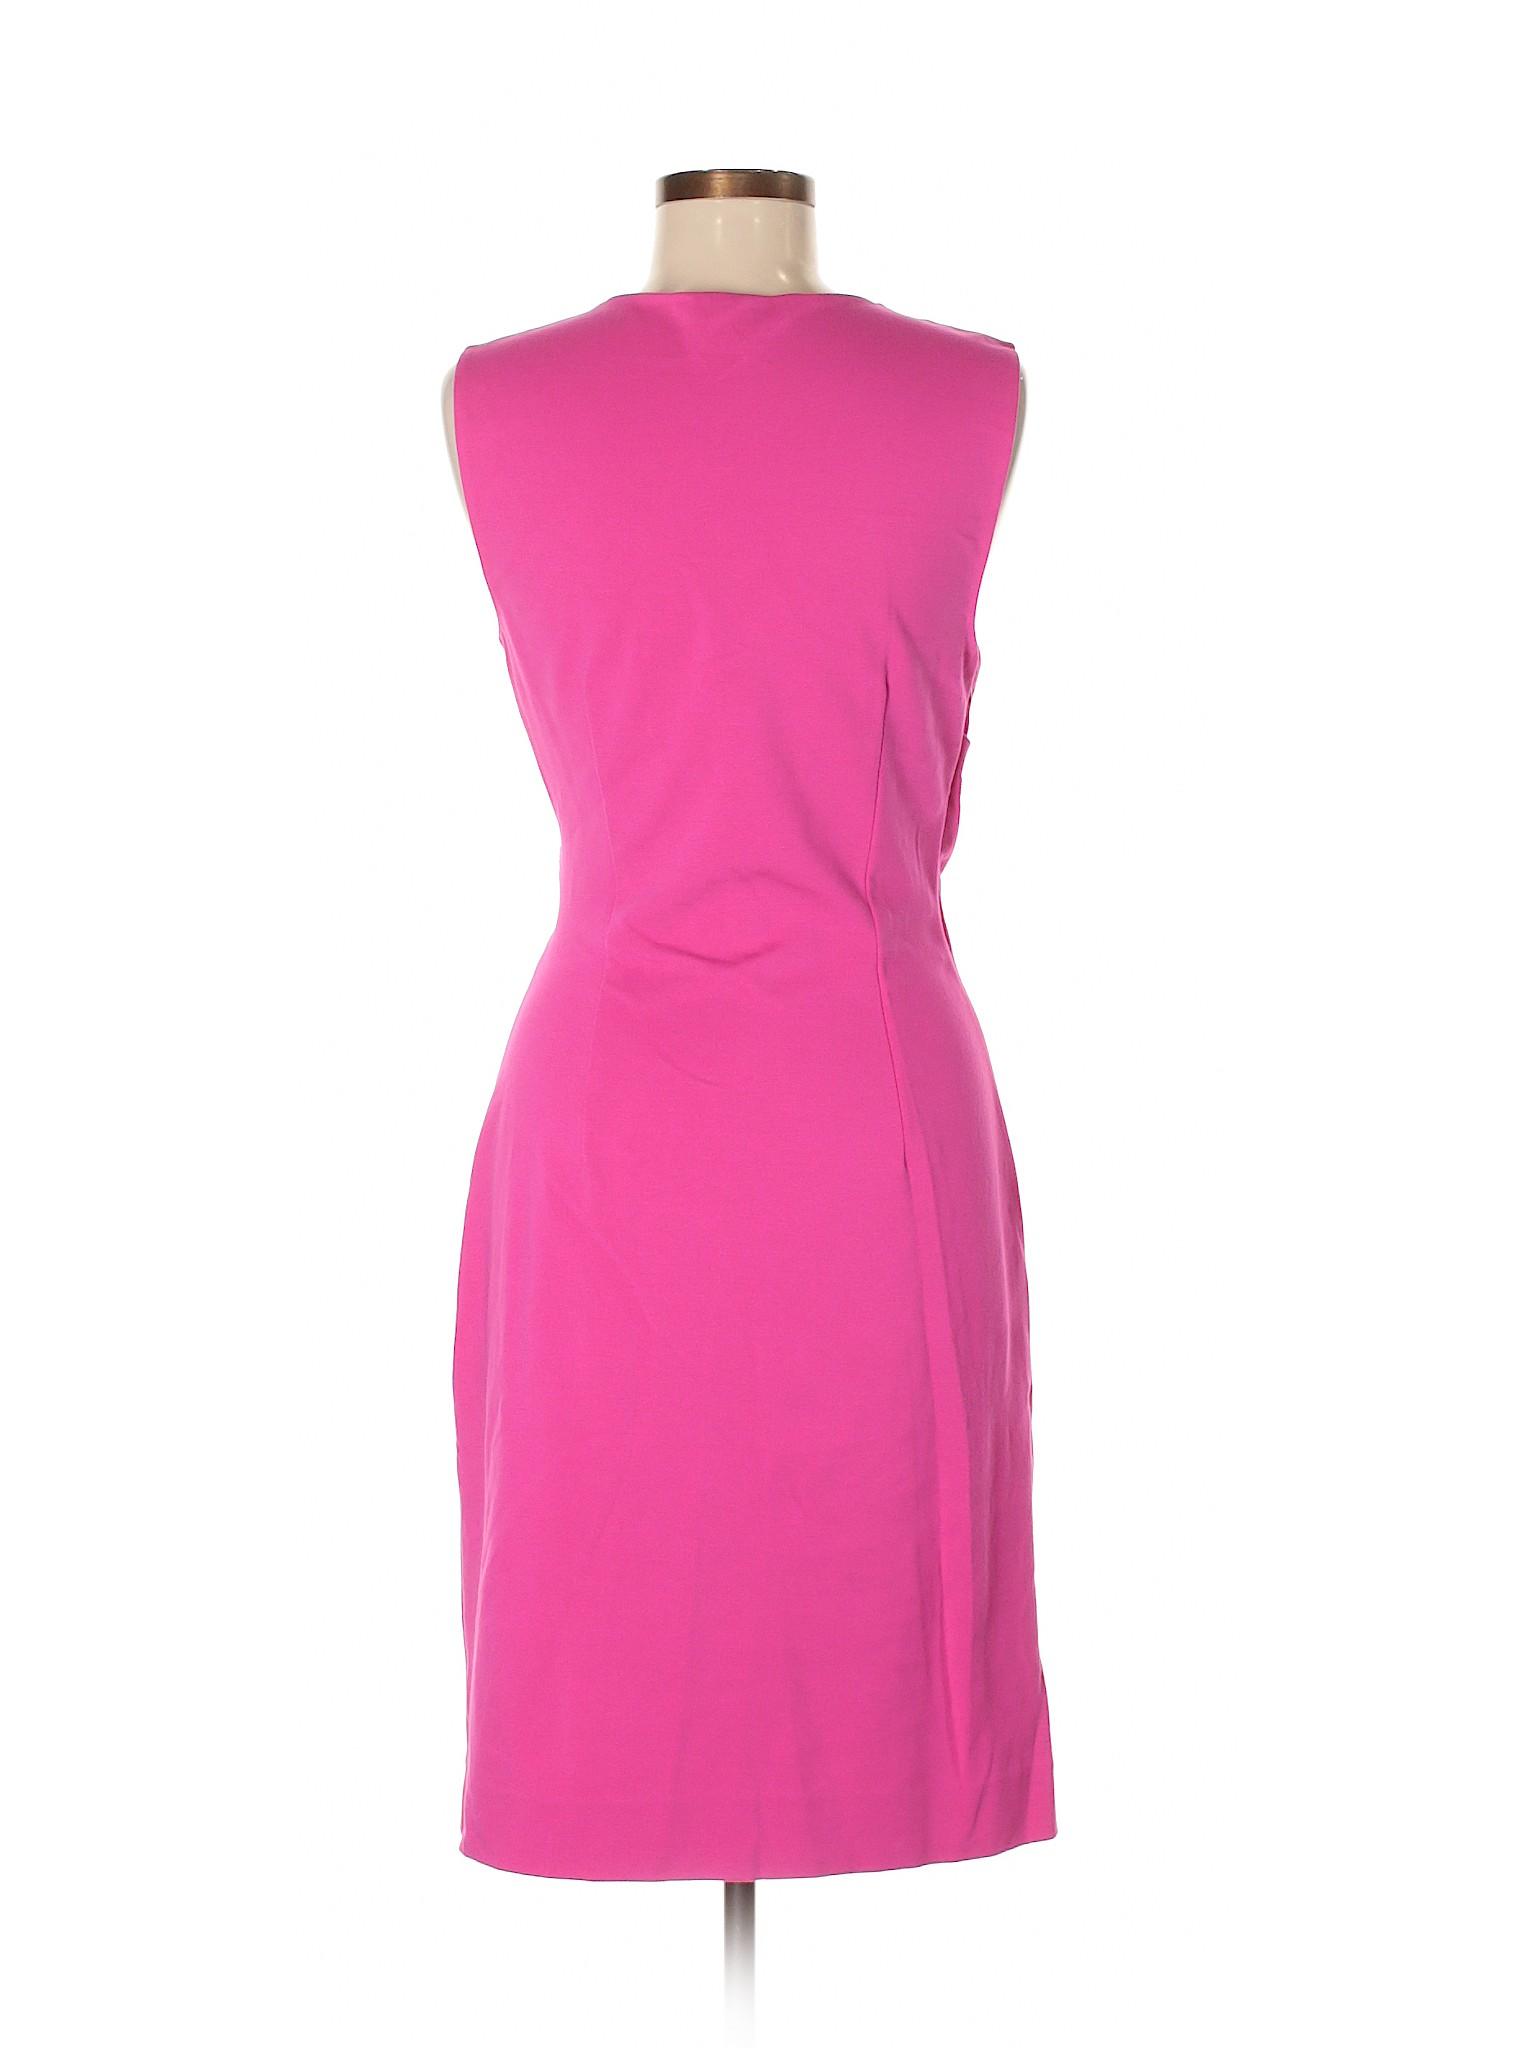 von Dress Casual Furstenberg Selling Diane O5qwAfAz